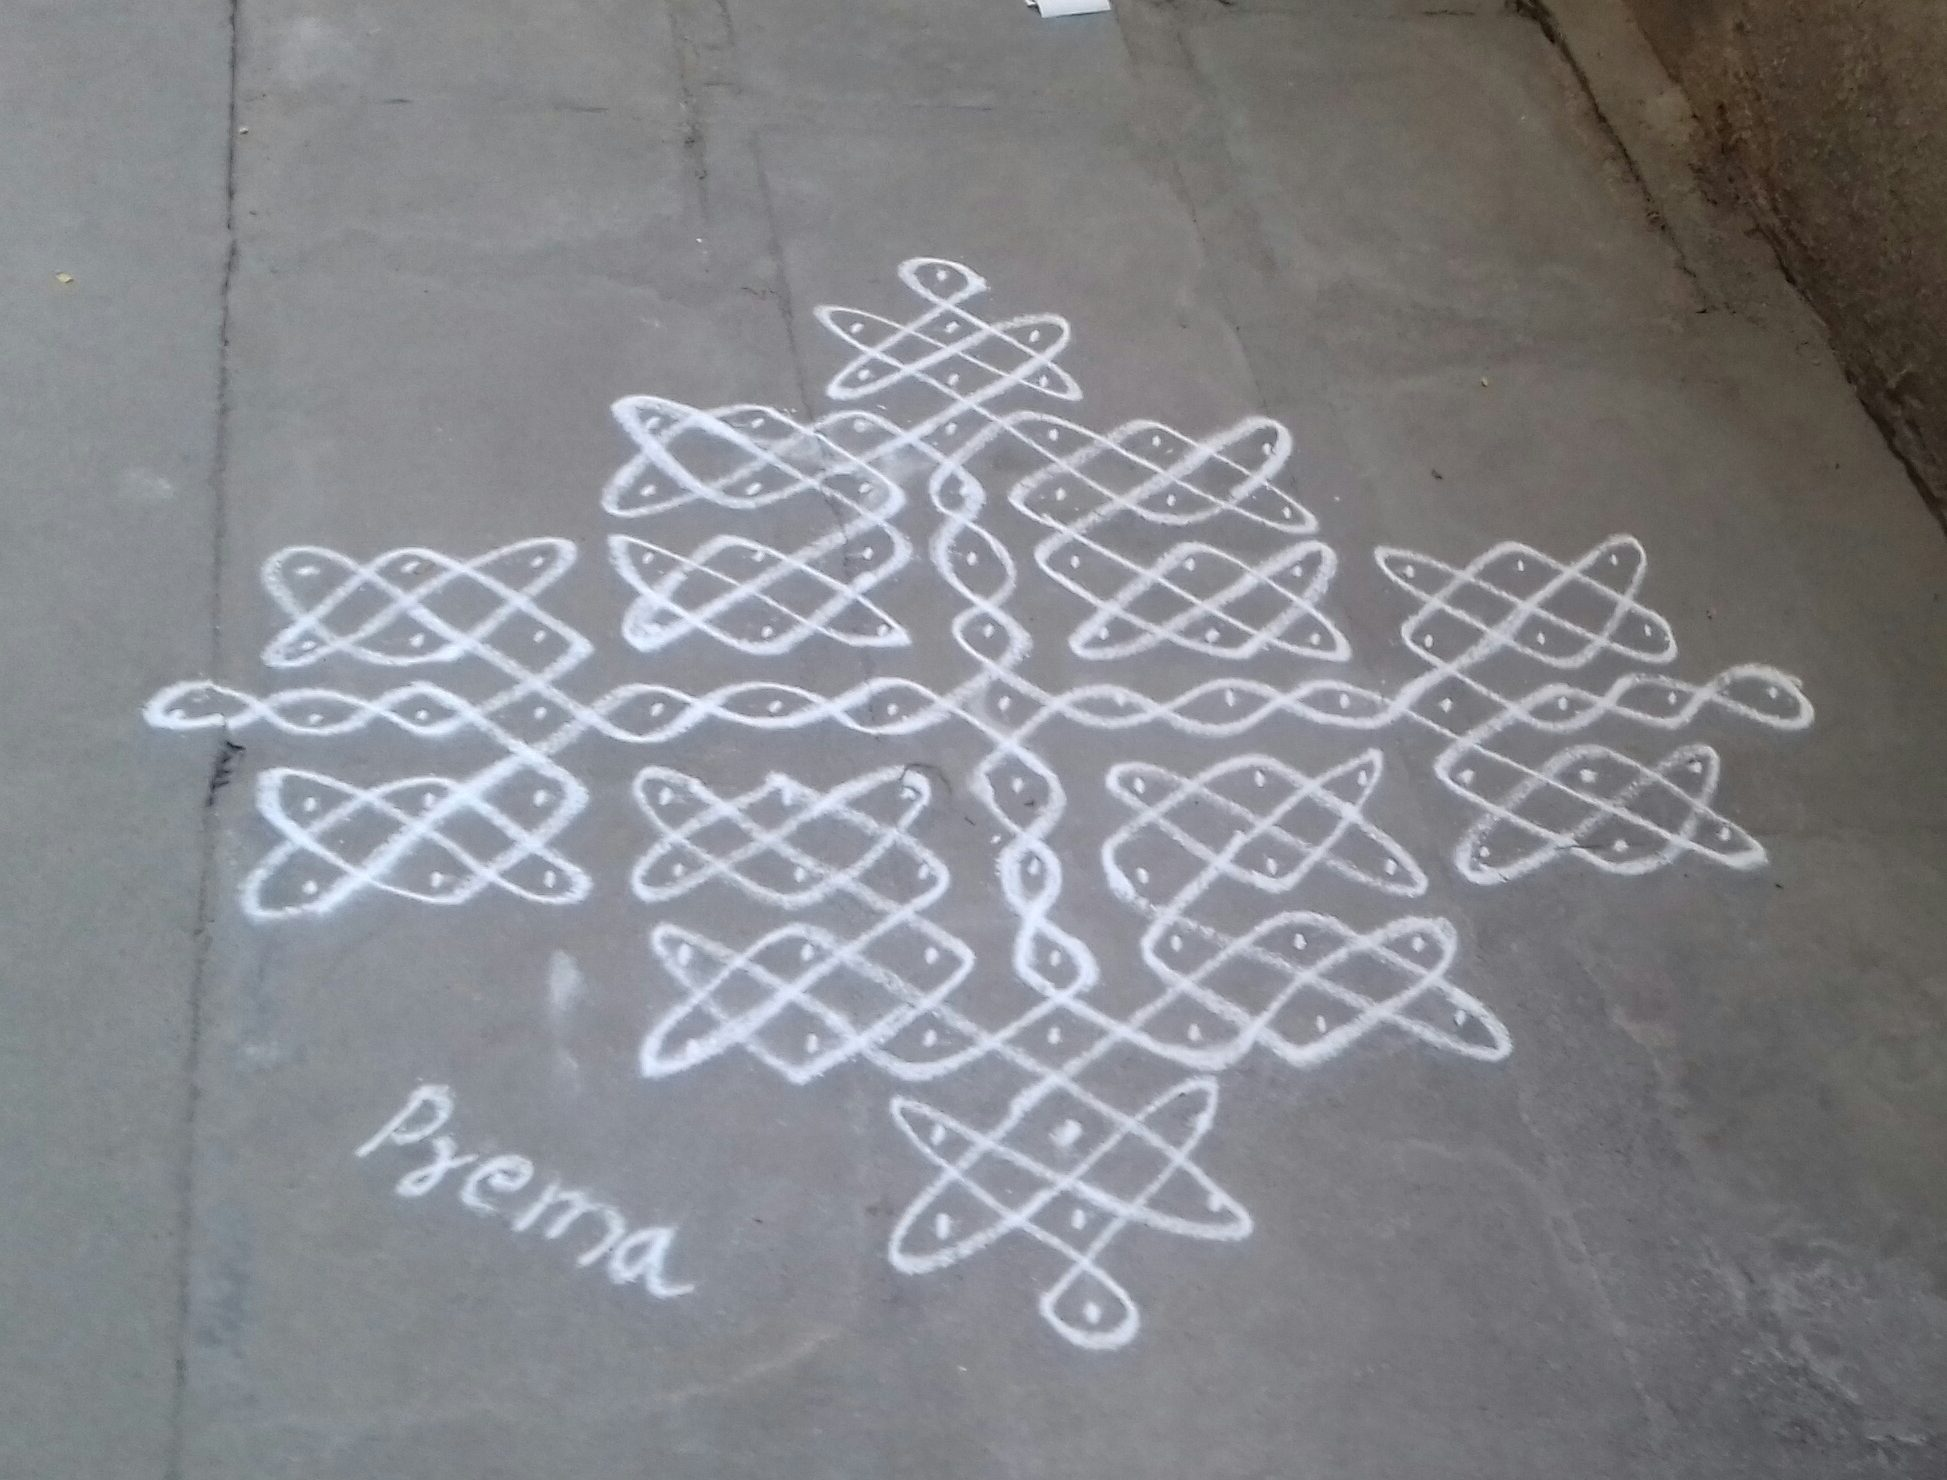 sikku kolam with 15 dots || contest kolam